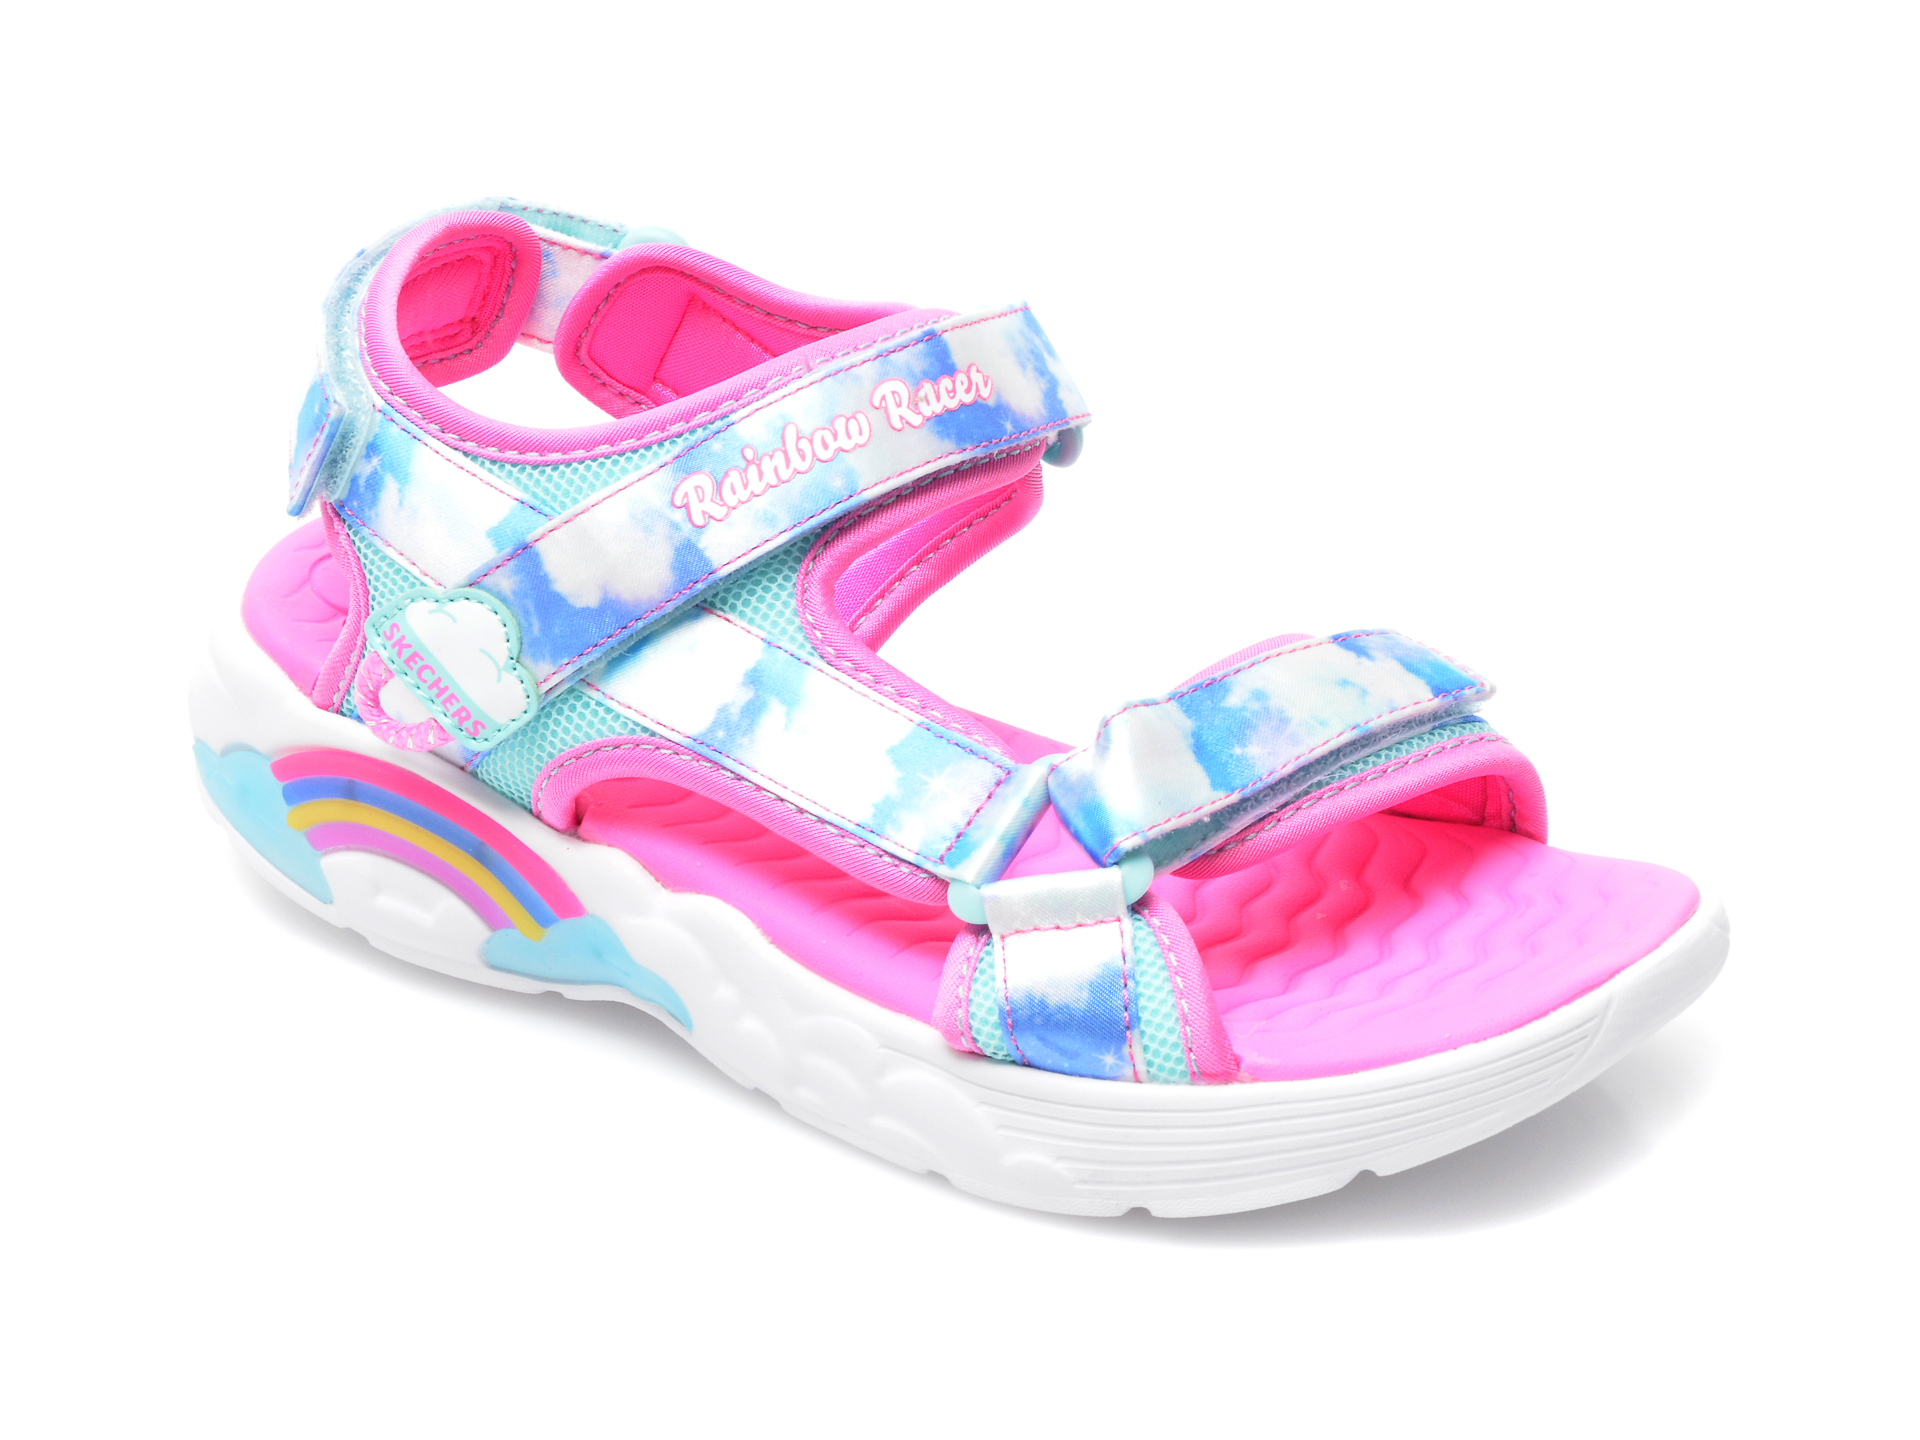 Sandale SKECHERS multicolor, 302975L, din material textil